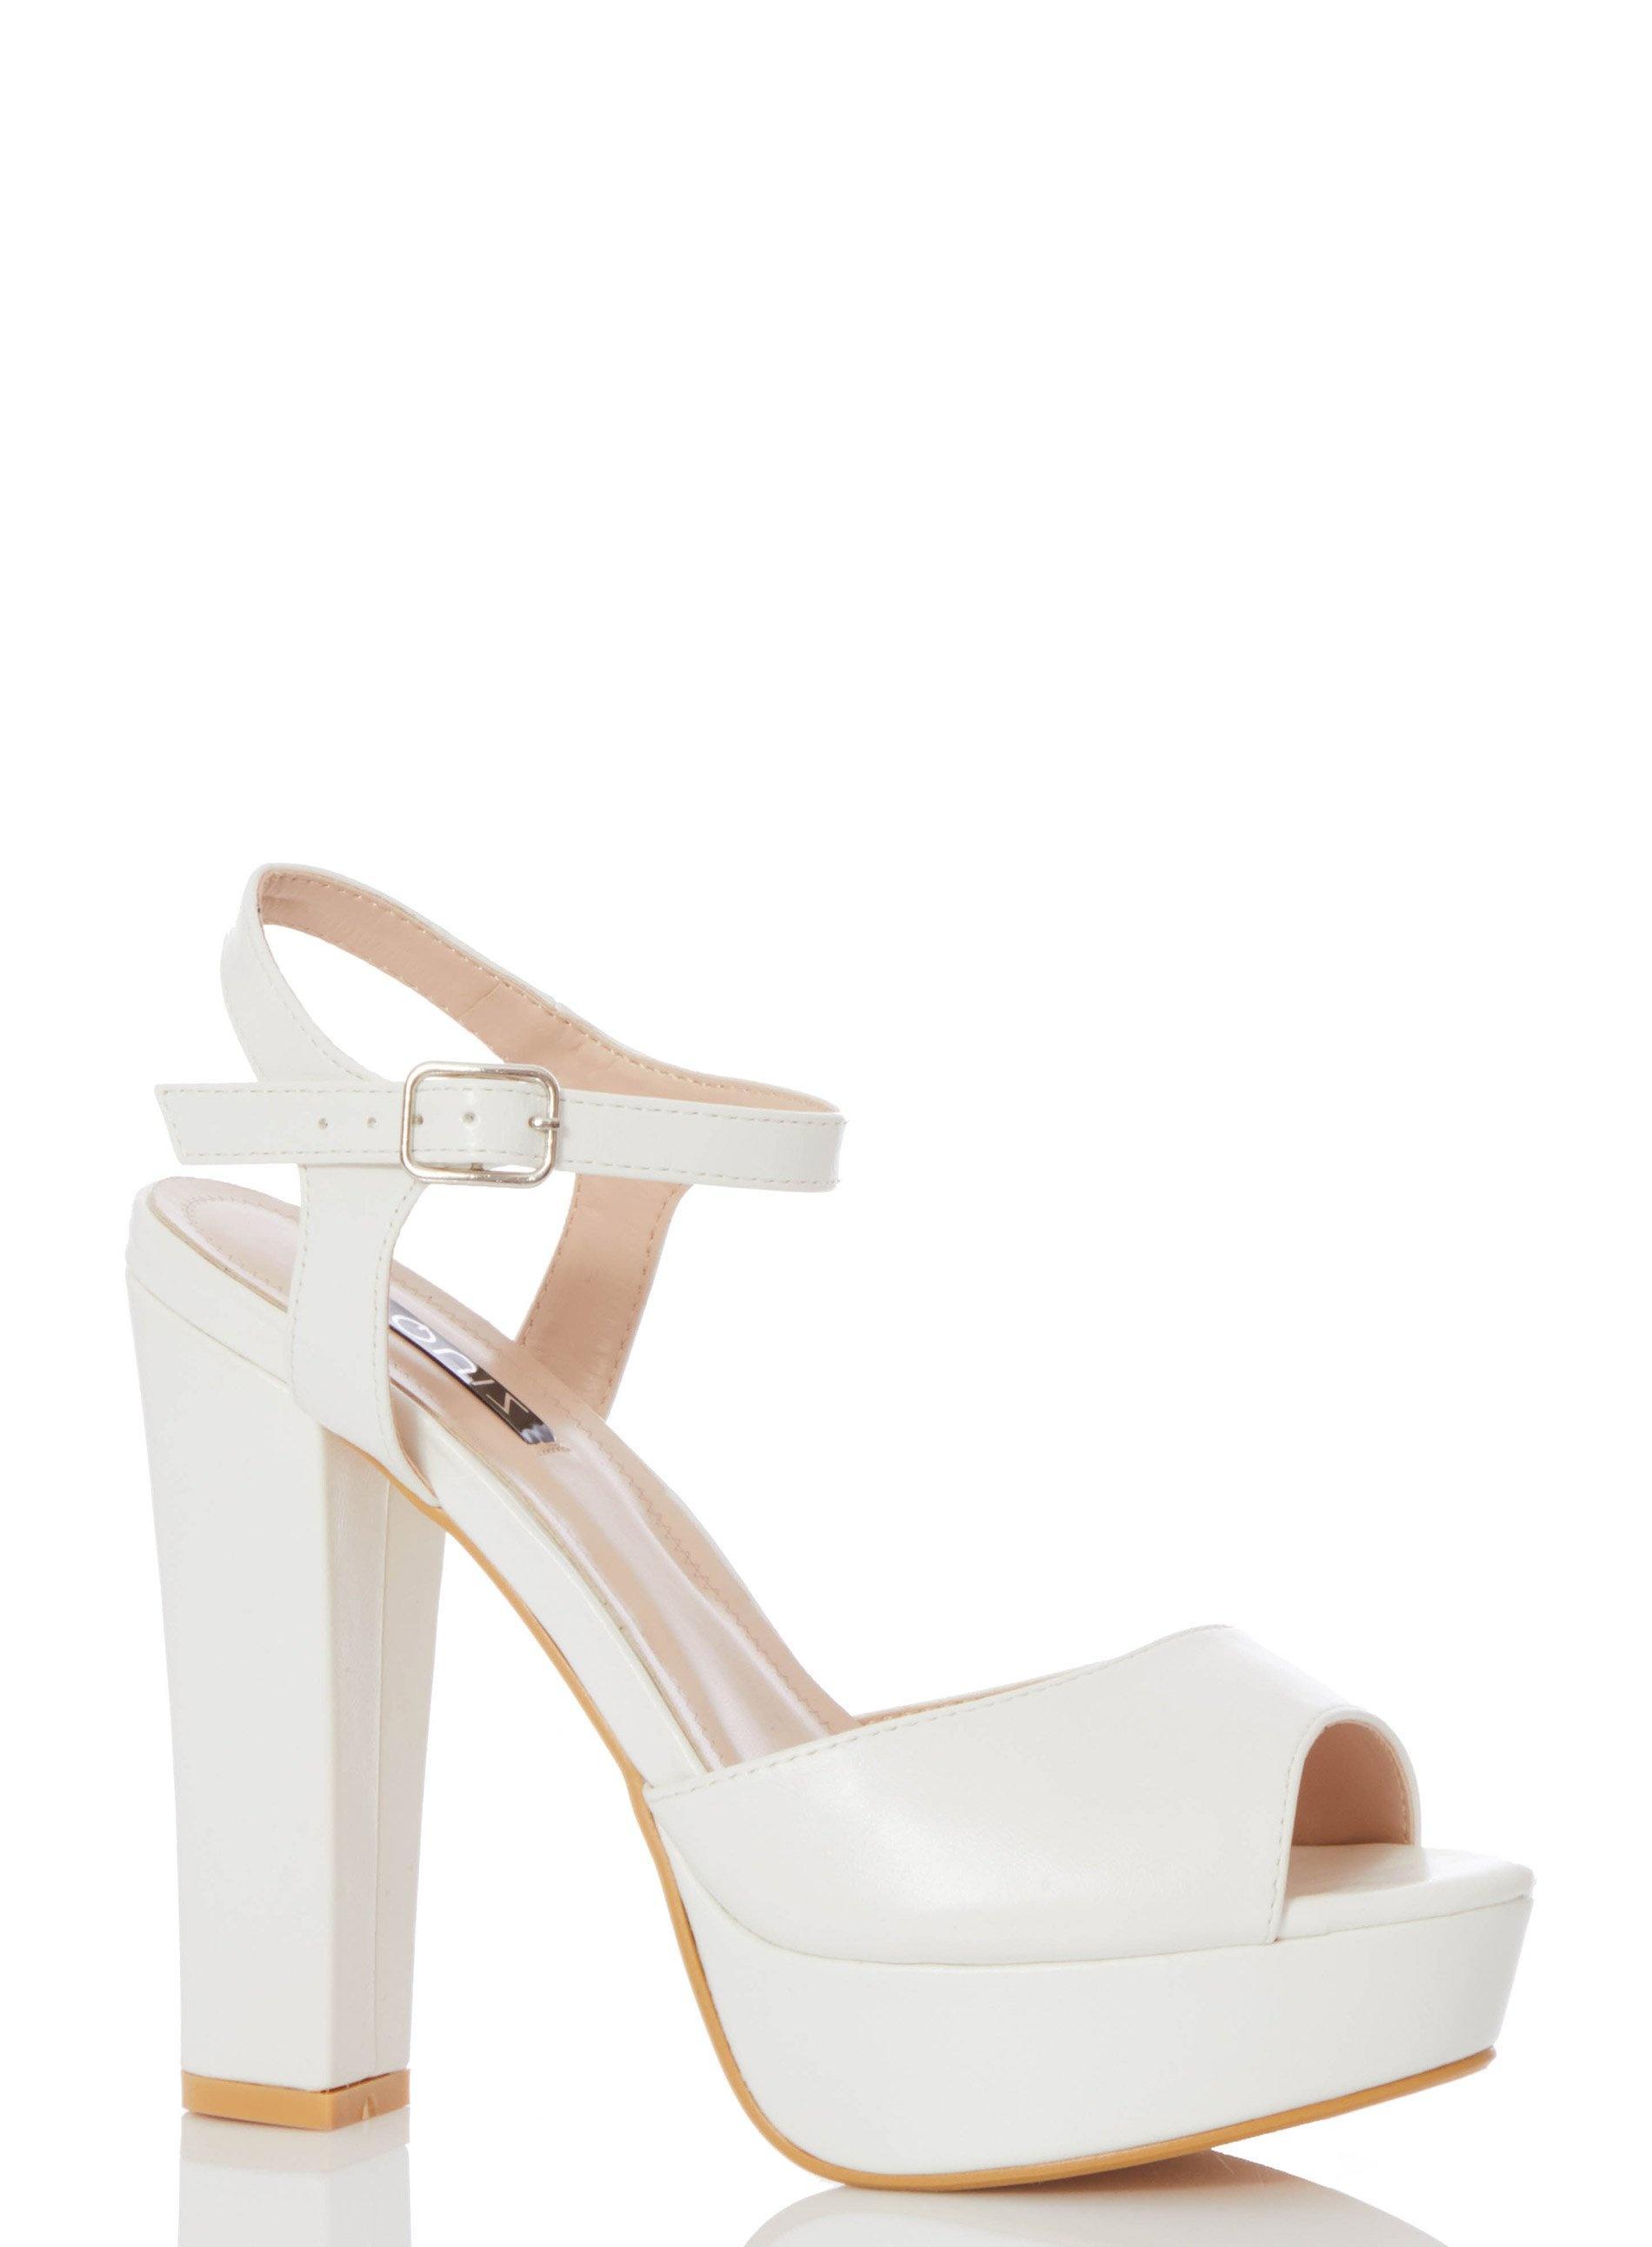 dcd673b5d Quiz - White Block Heel Sandals - Lyst. View fullscreen